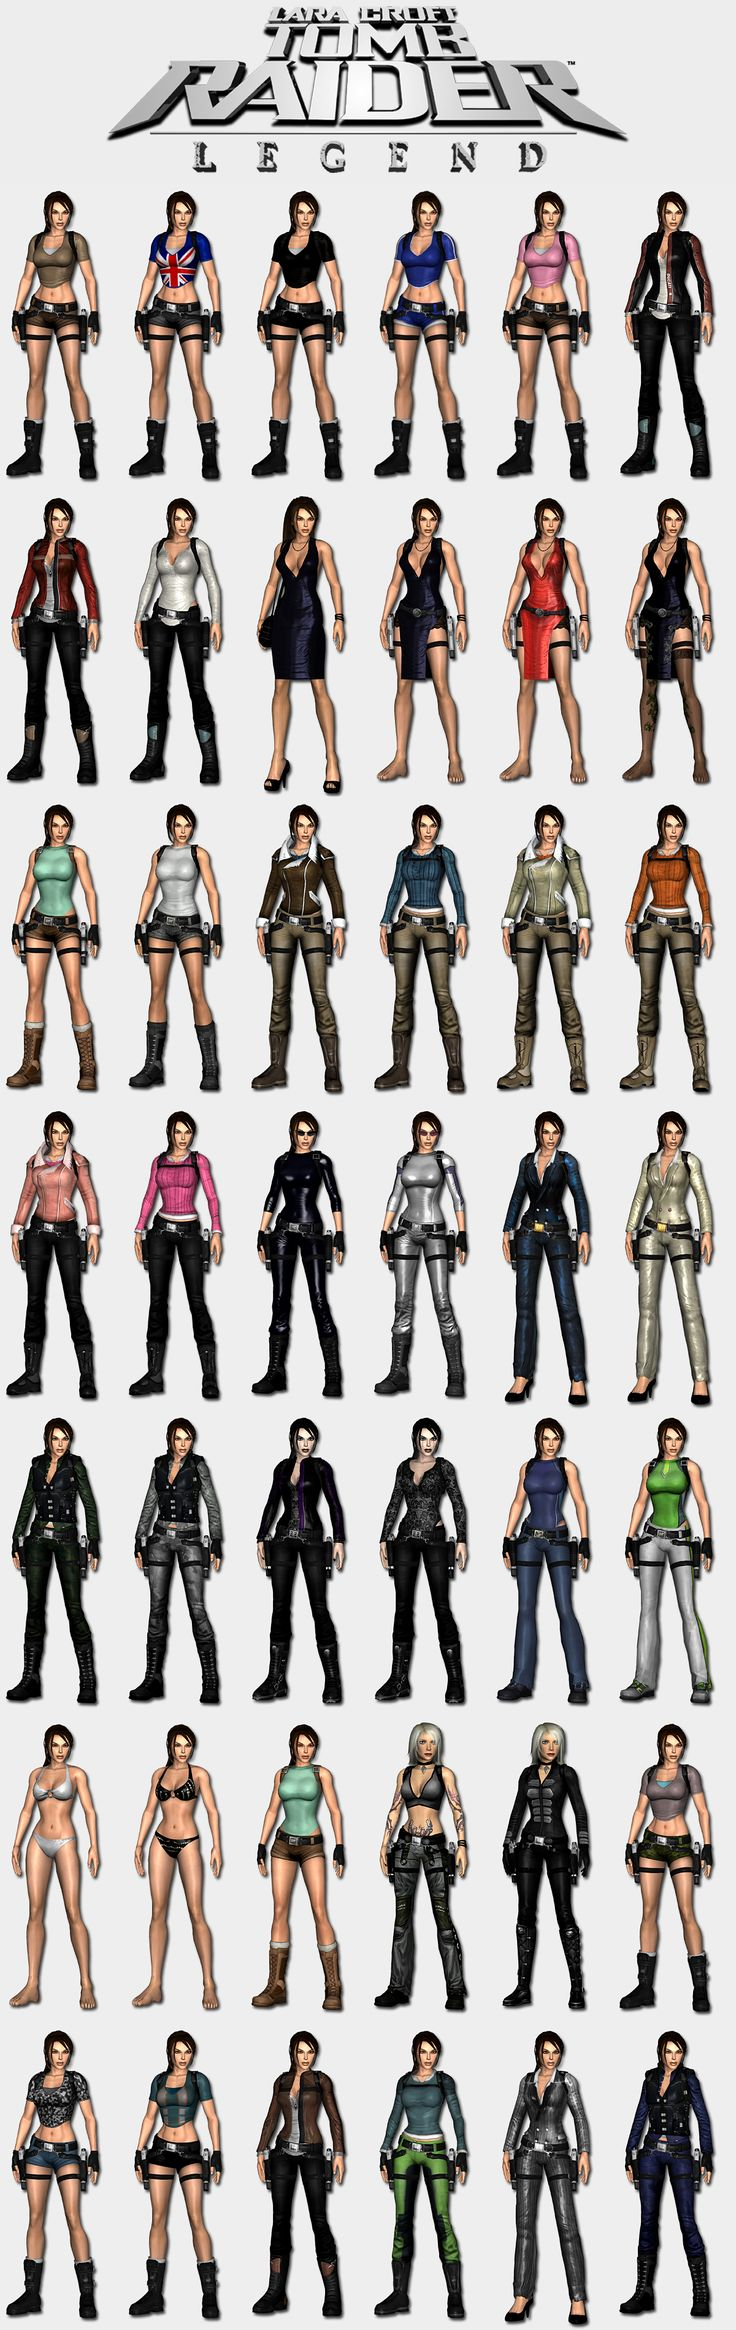 Tomb Raider Legend - Lara's outfits by HailSatana